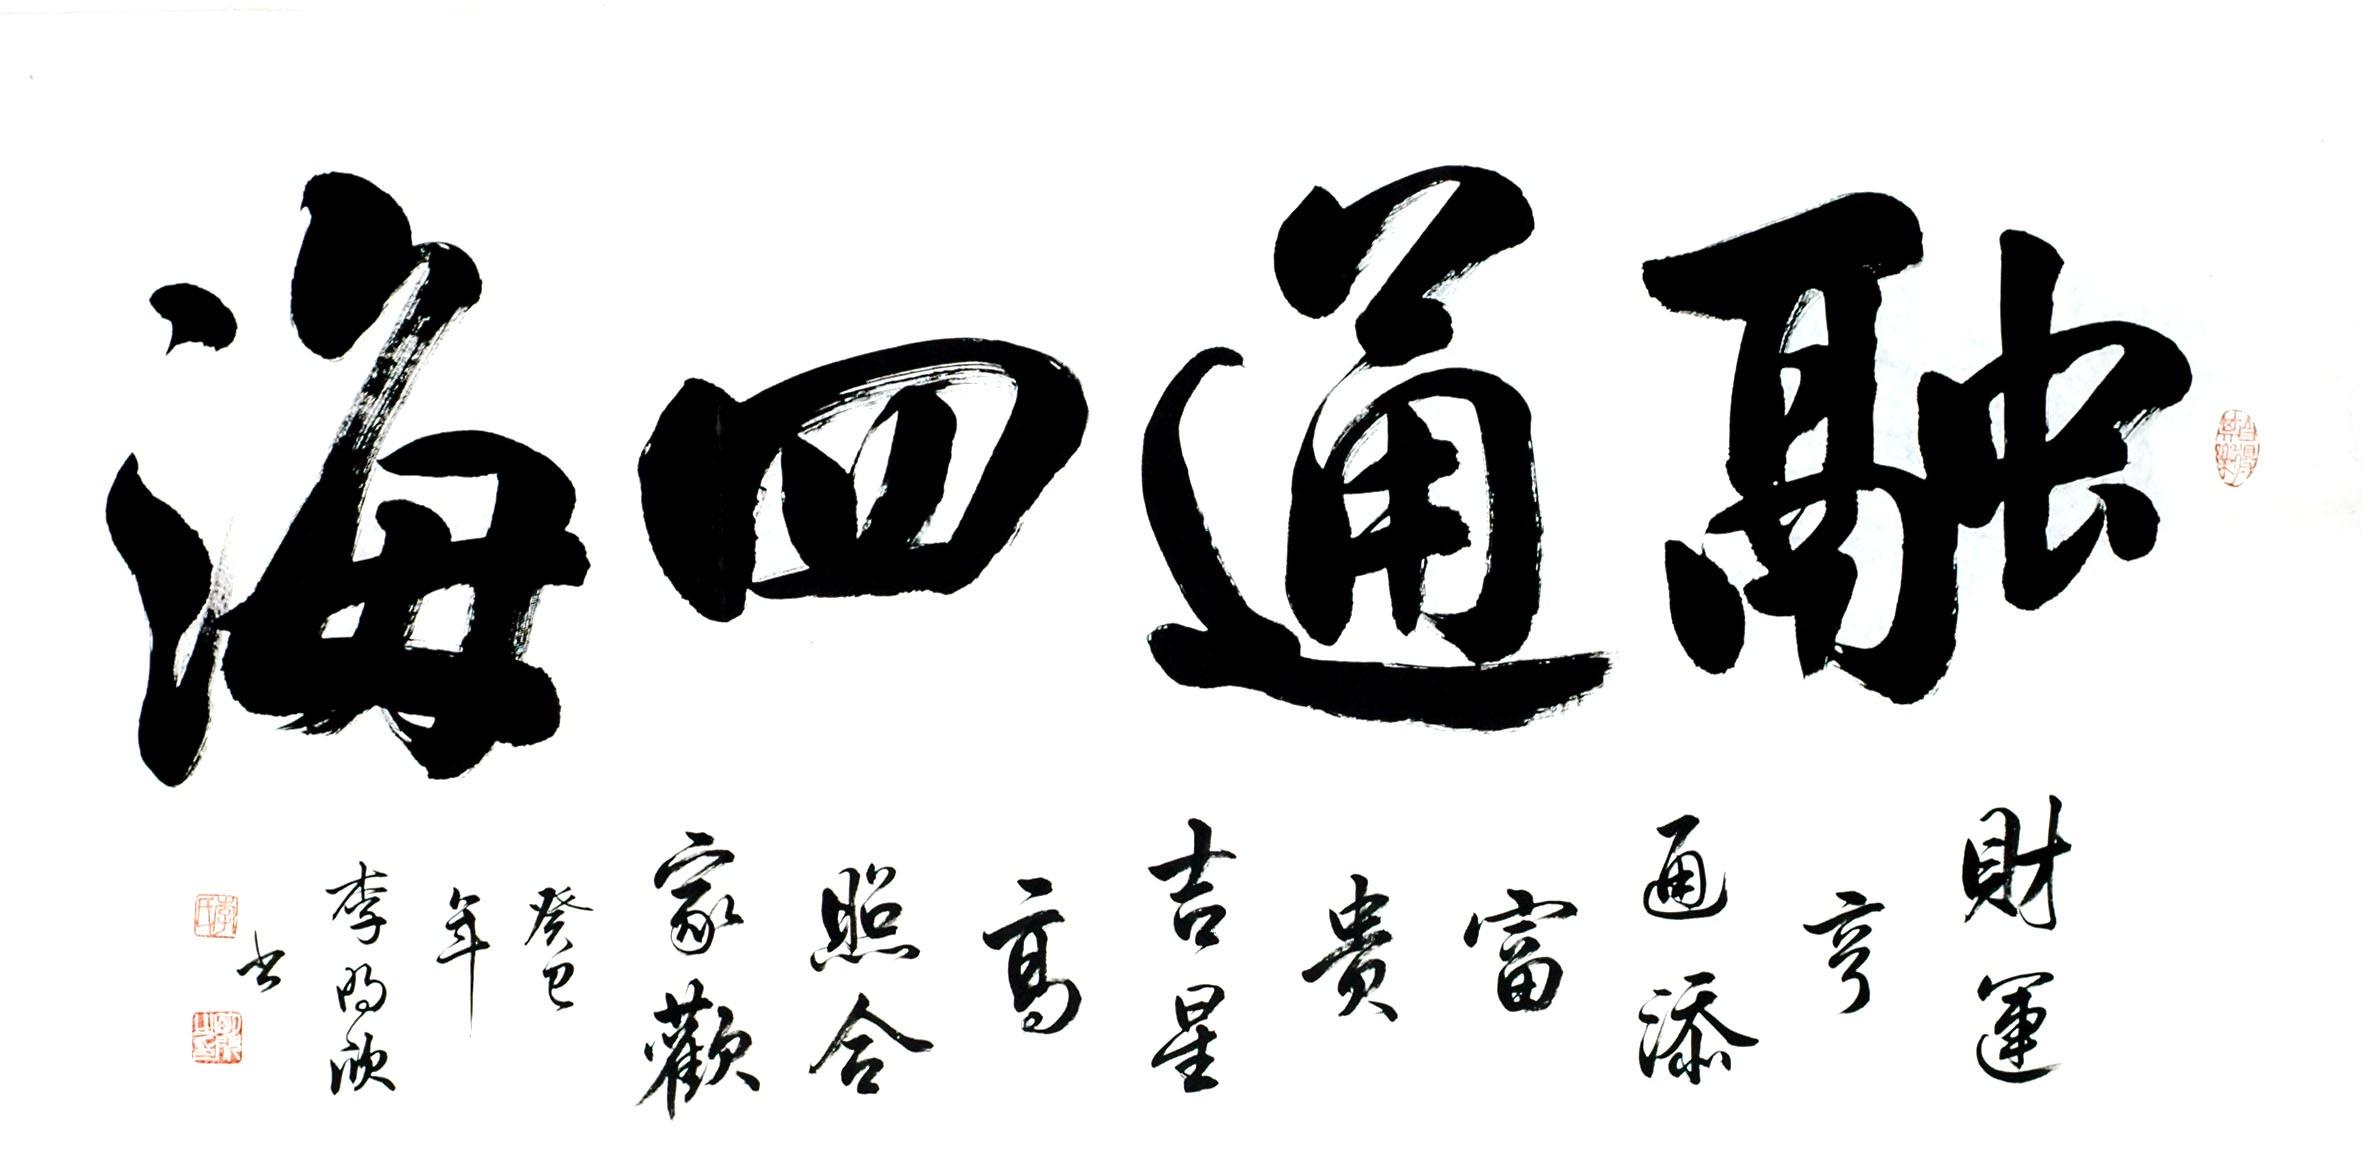 Chinese Cursive Scripts Painting - CNAG013410